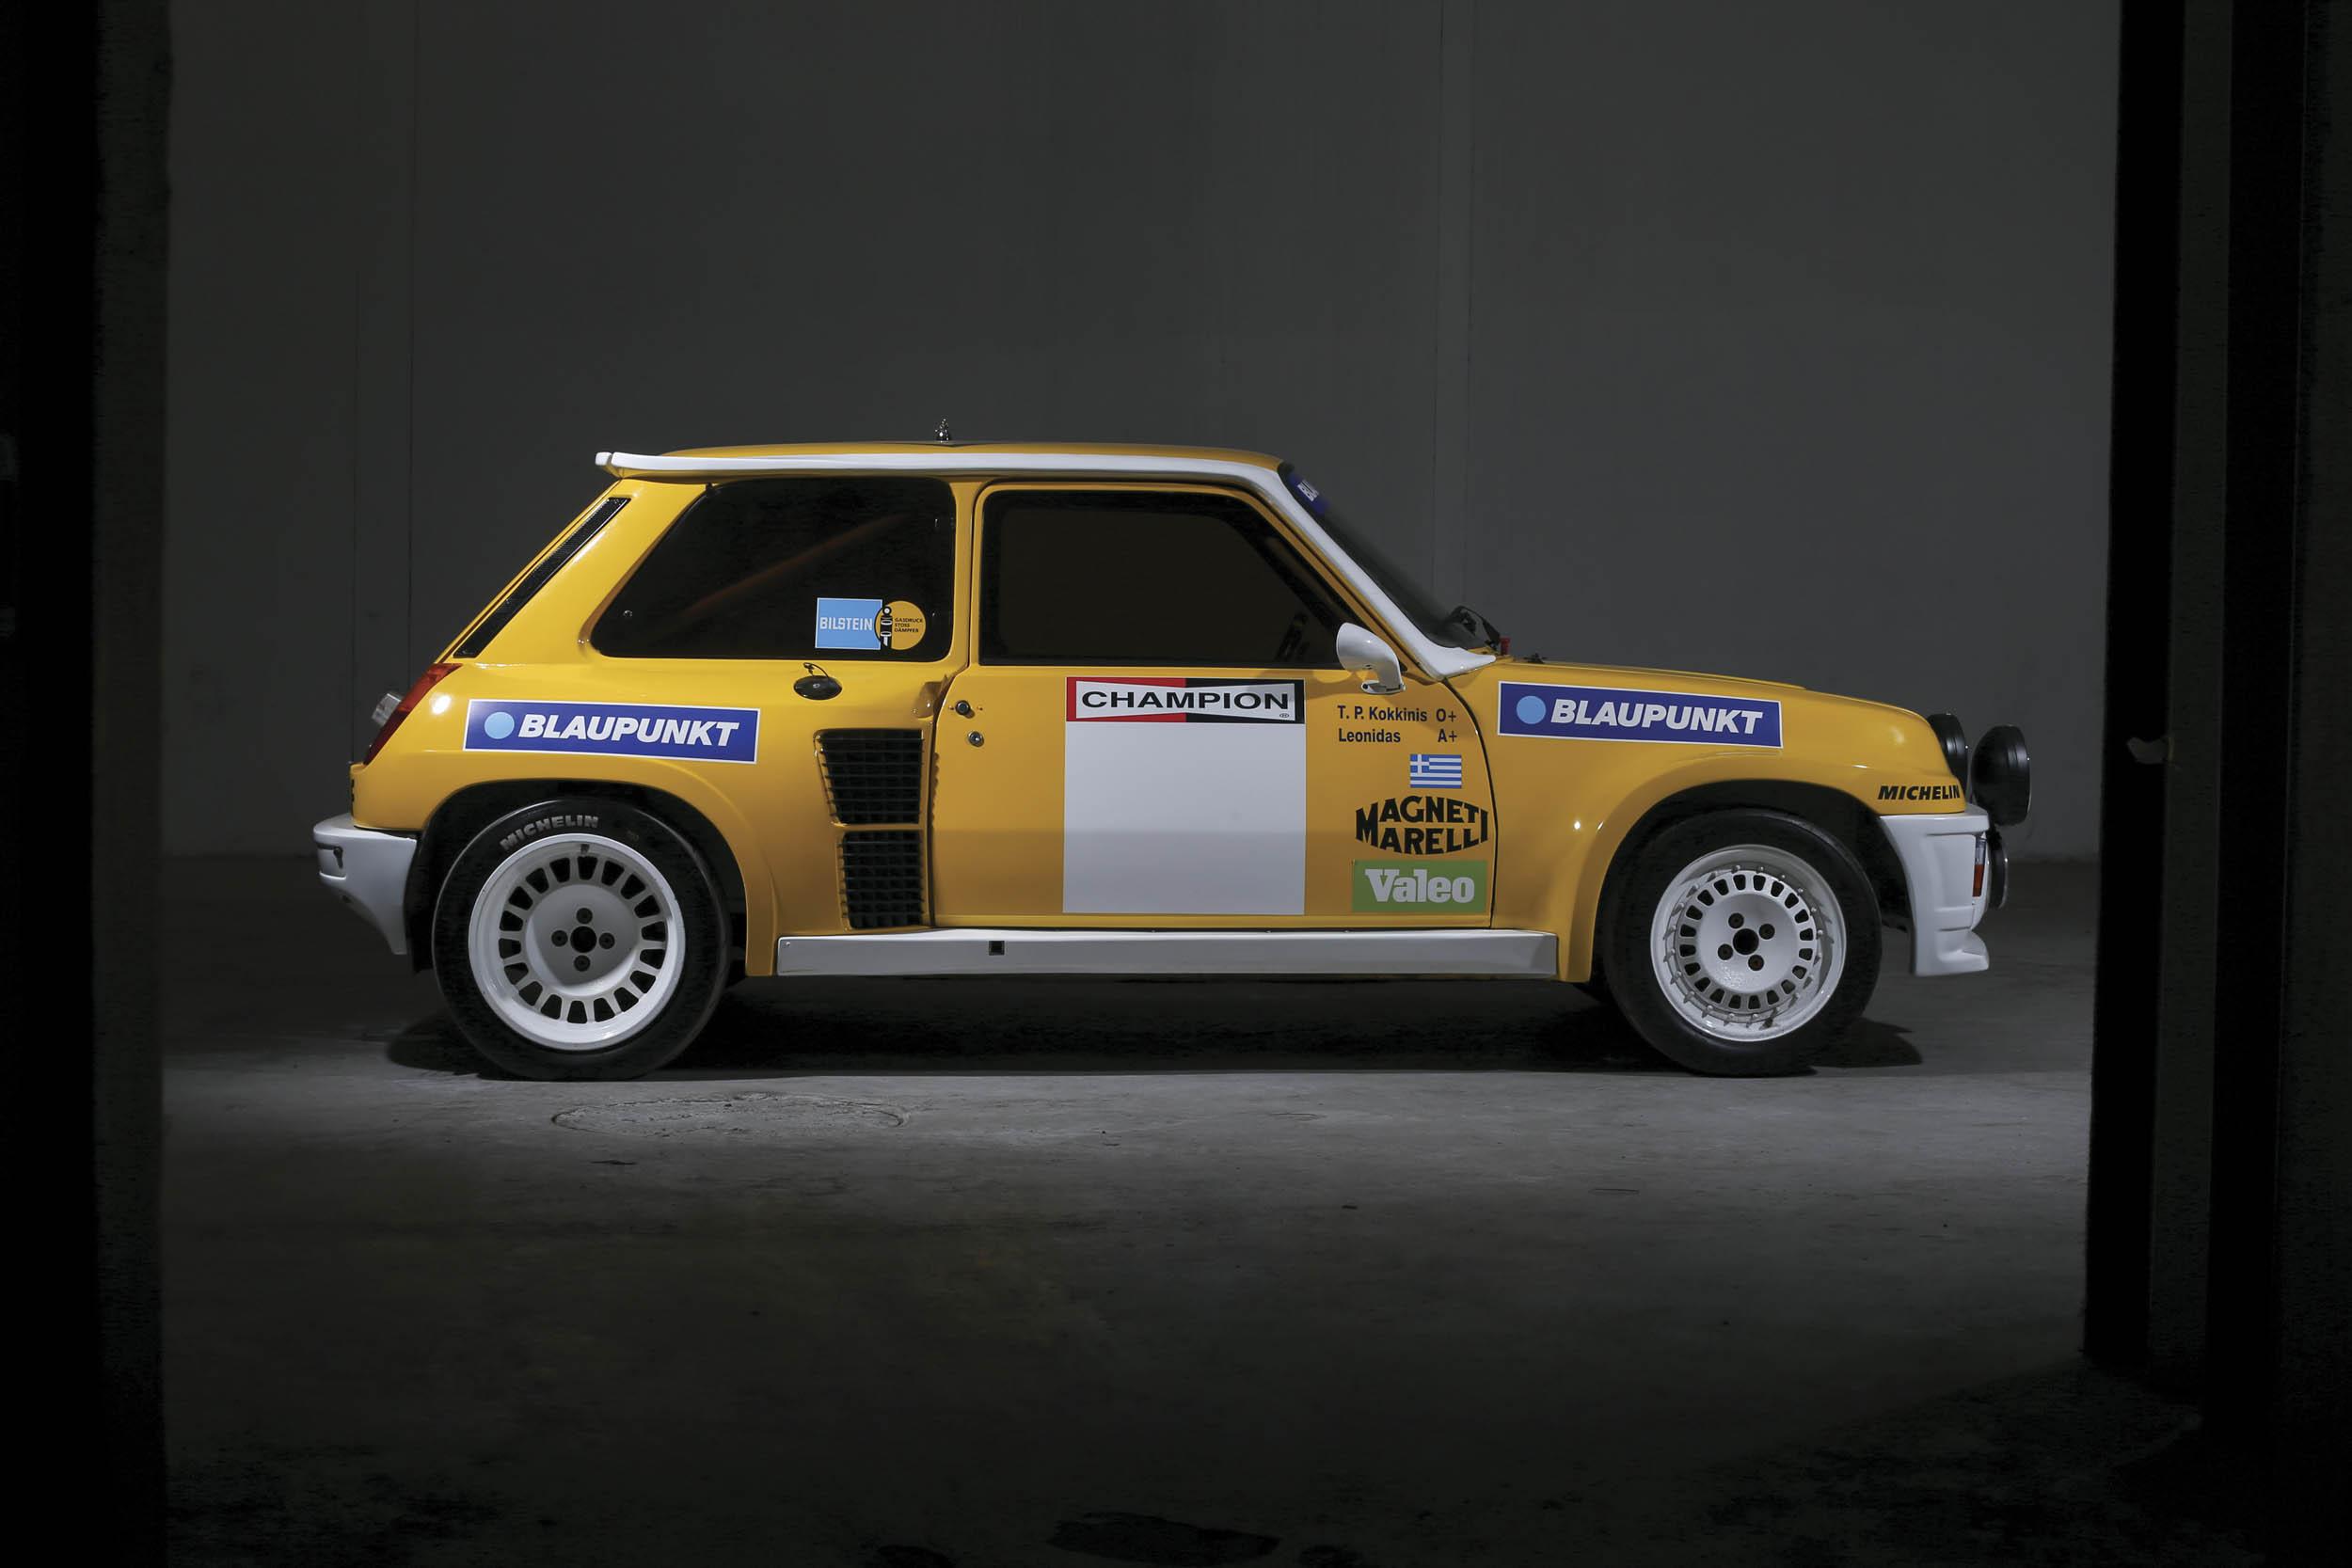 1980 Renault 5 Turbo profile